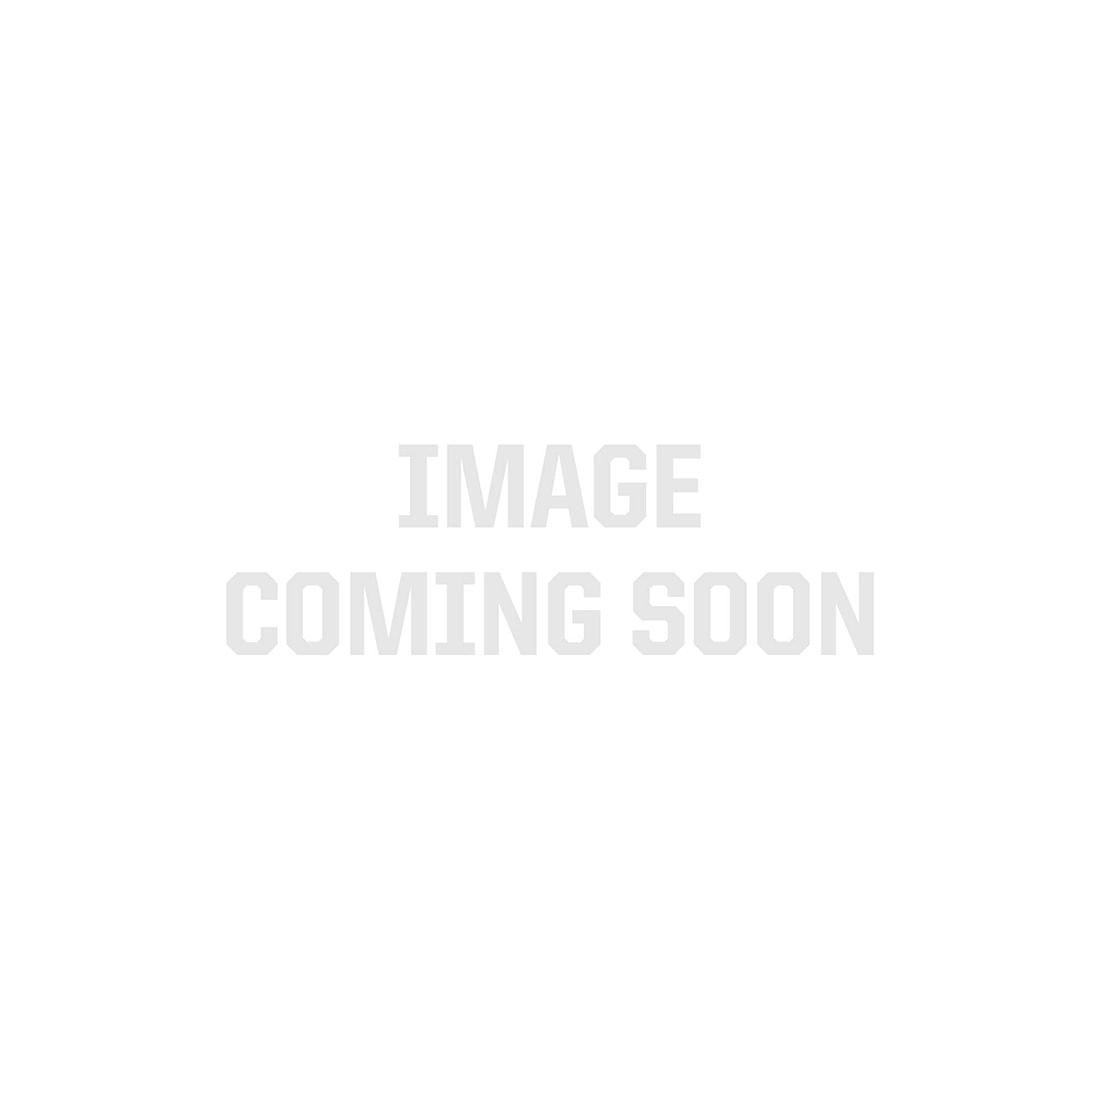 MaxLite 2x2 Direct Lit LED Flat Panel Economical Series, 33 Watts